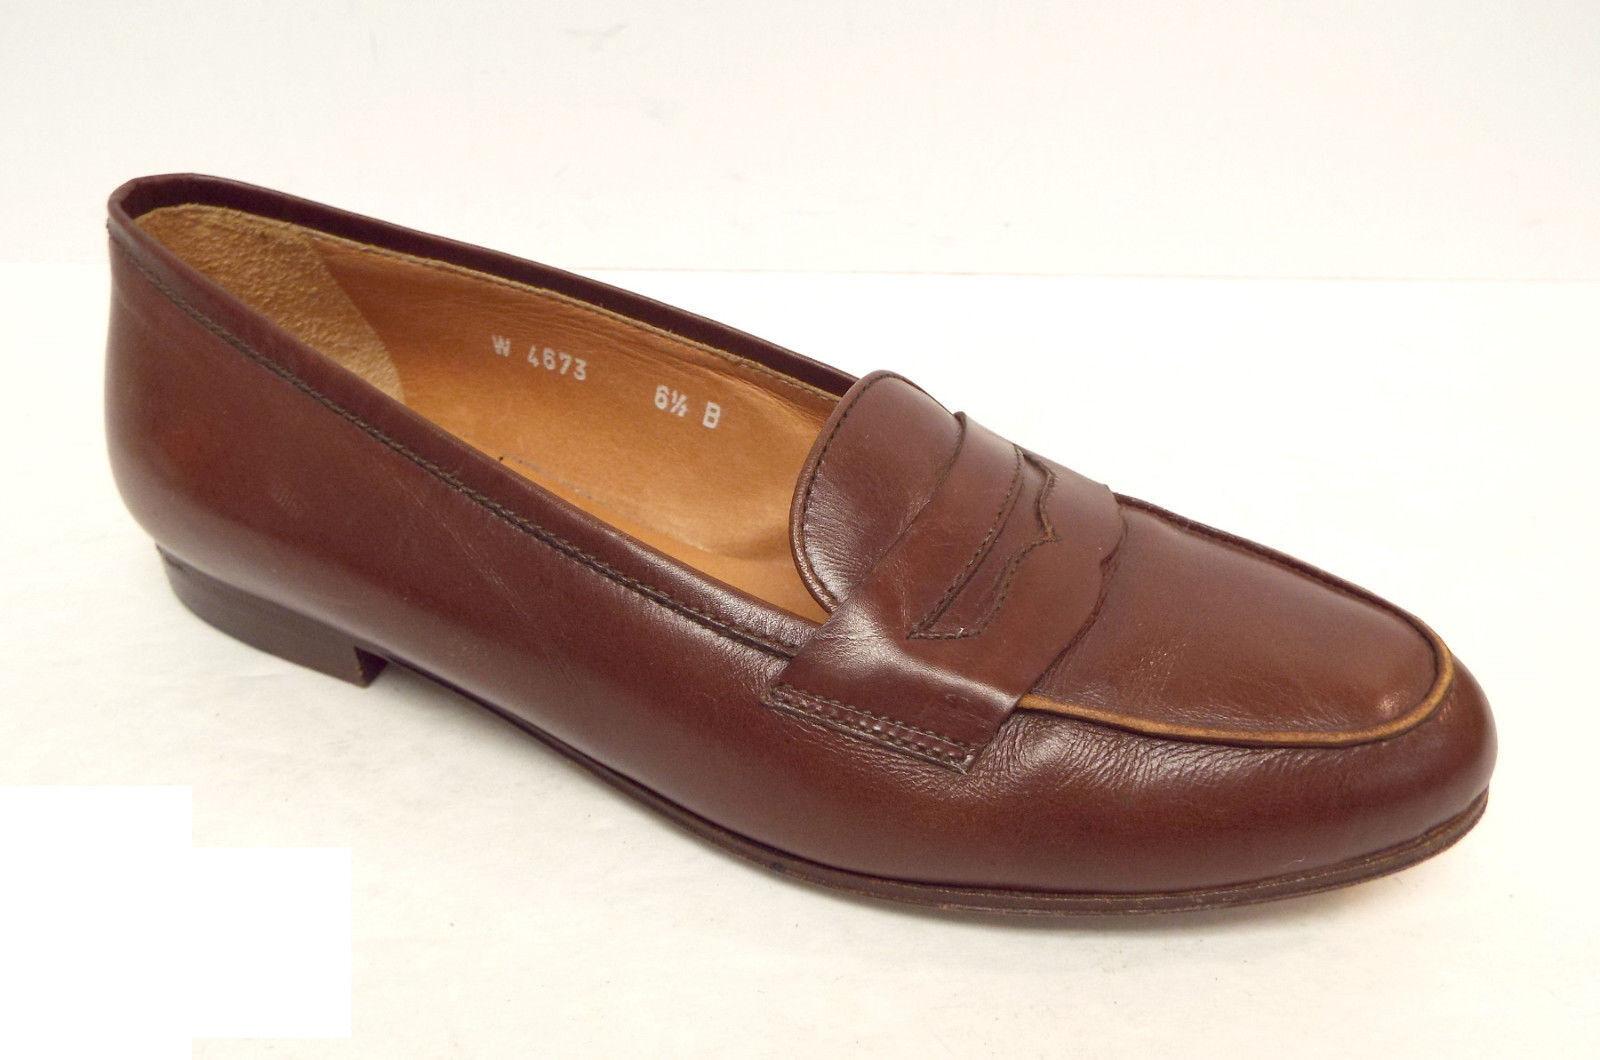 RALPH LAUREN Collection Größe 6.5 Braun Leder Penny Loafers Flats Schuhes 6 1/2